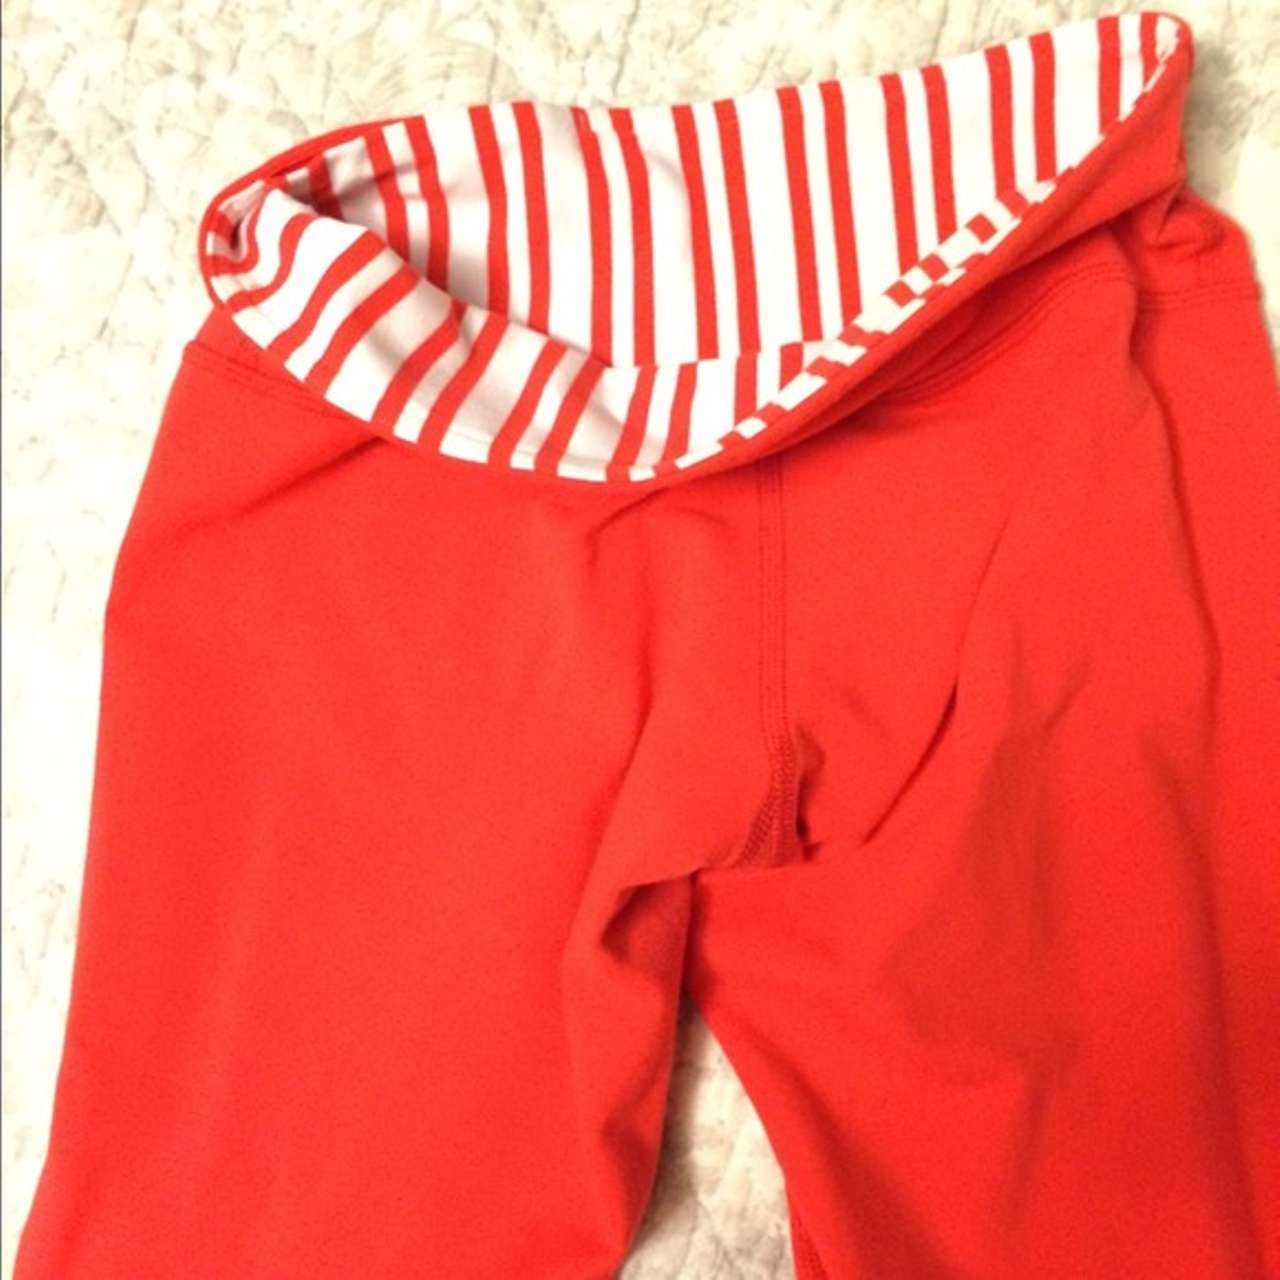 Lululemon Wunder Under Pant *Reversible - Love Red / Twin Stripe Love Red